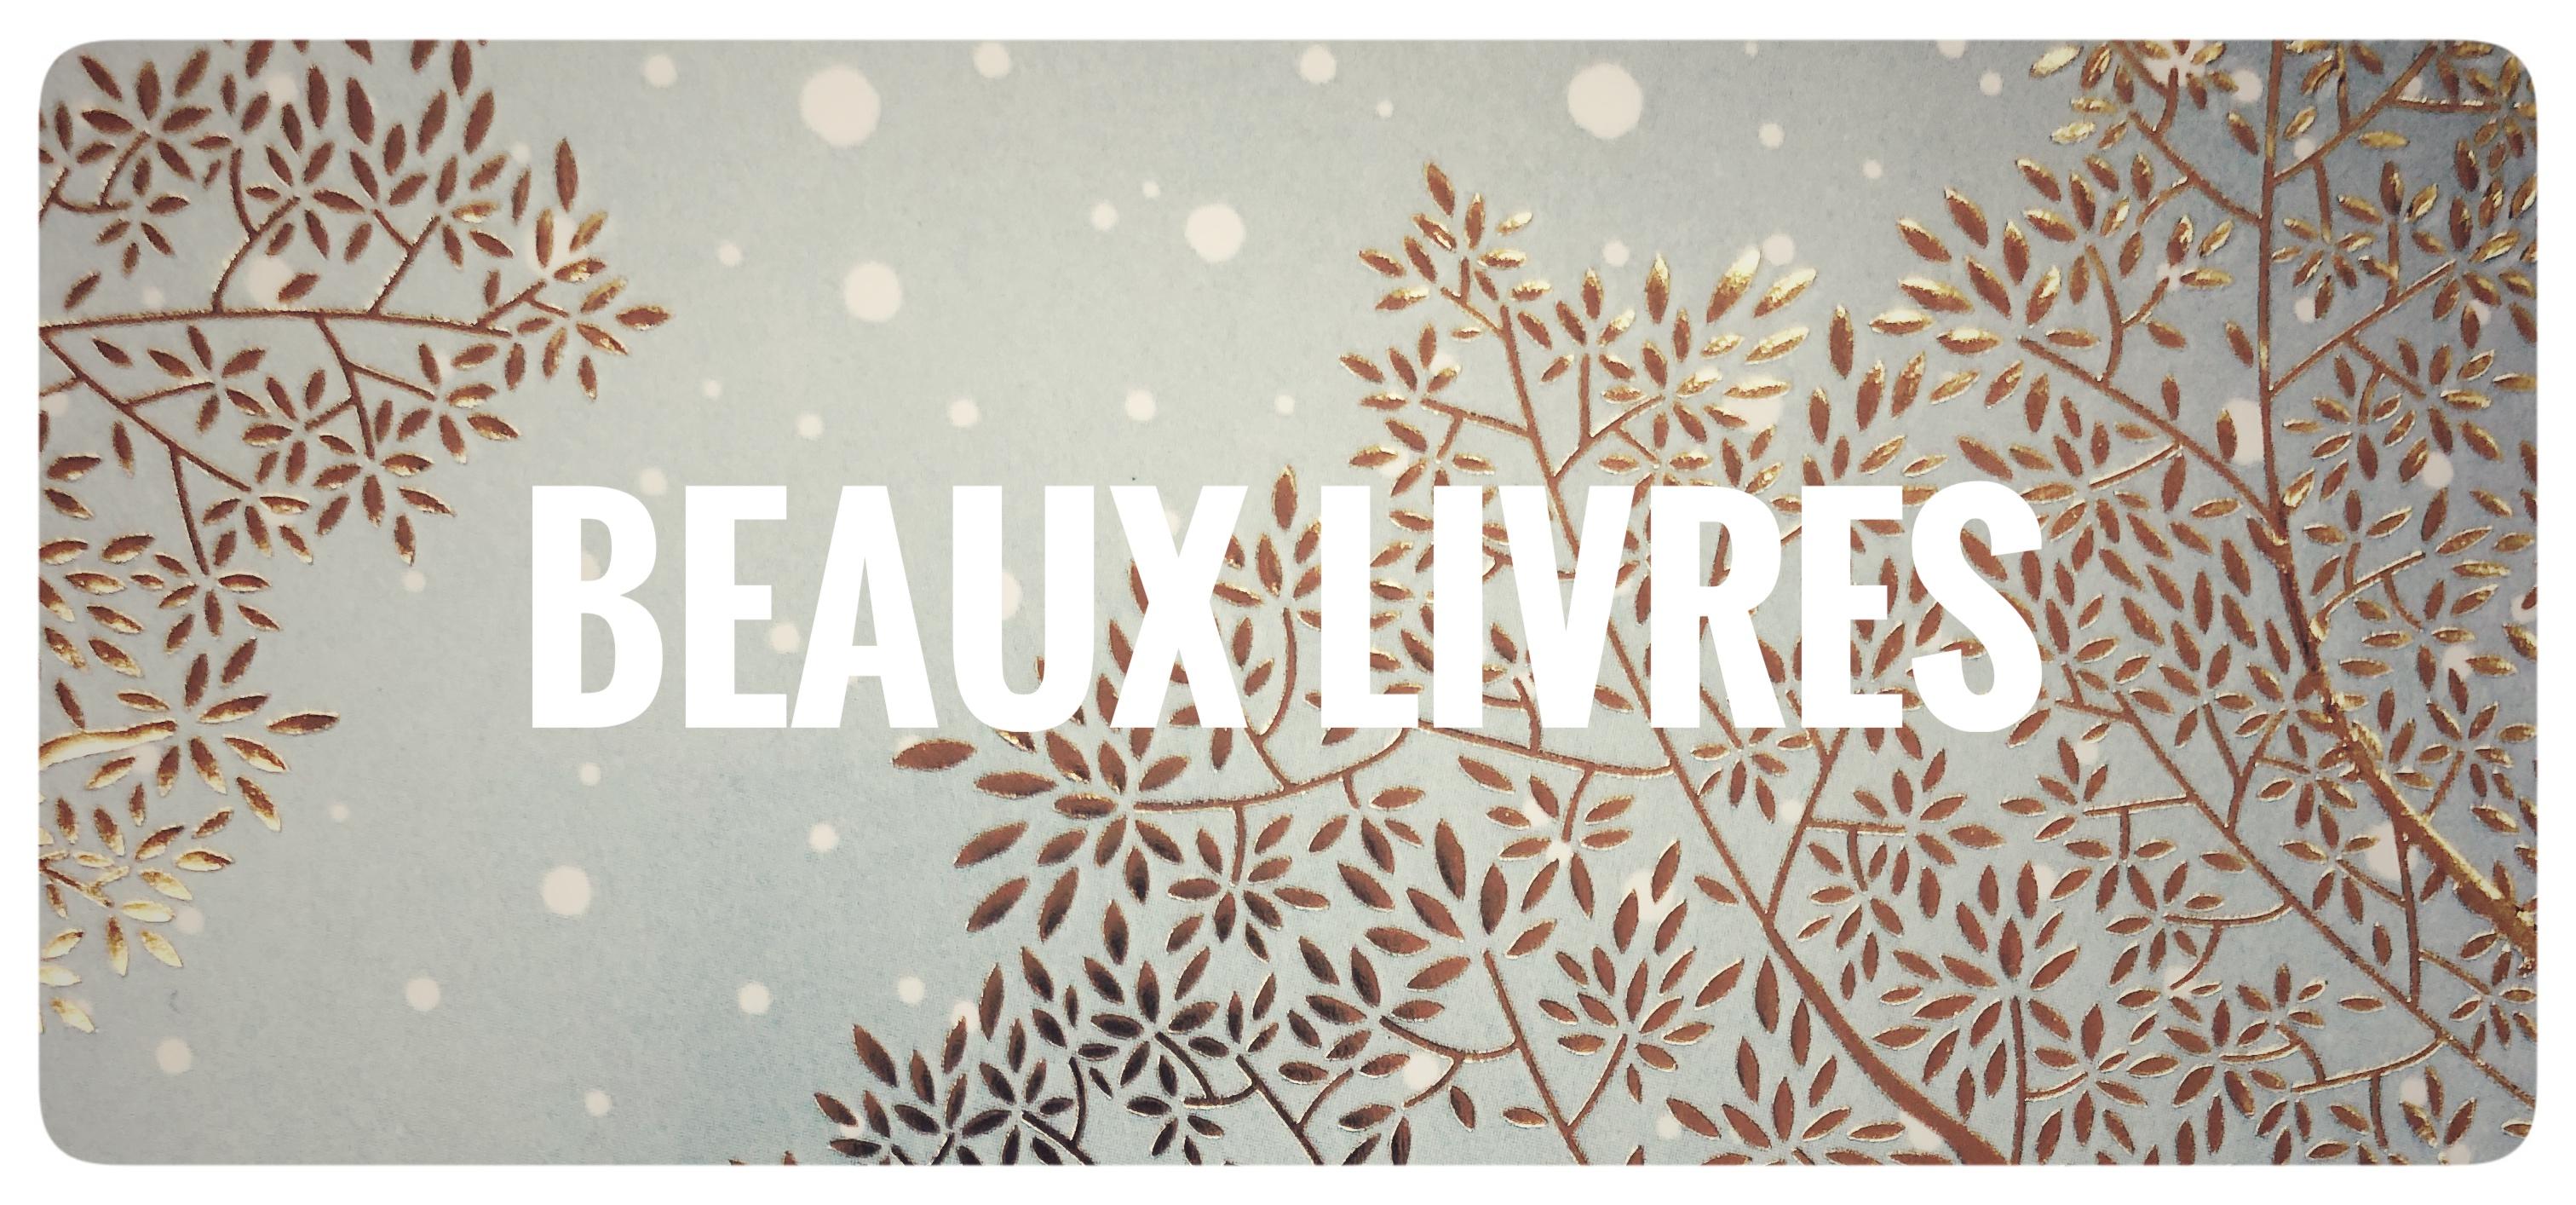 https://gestion.librairiejeancalvin.fr/themes/default/img/accueil/Noel_2020_beaux_livres.jpg